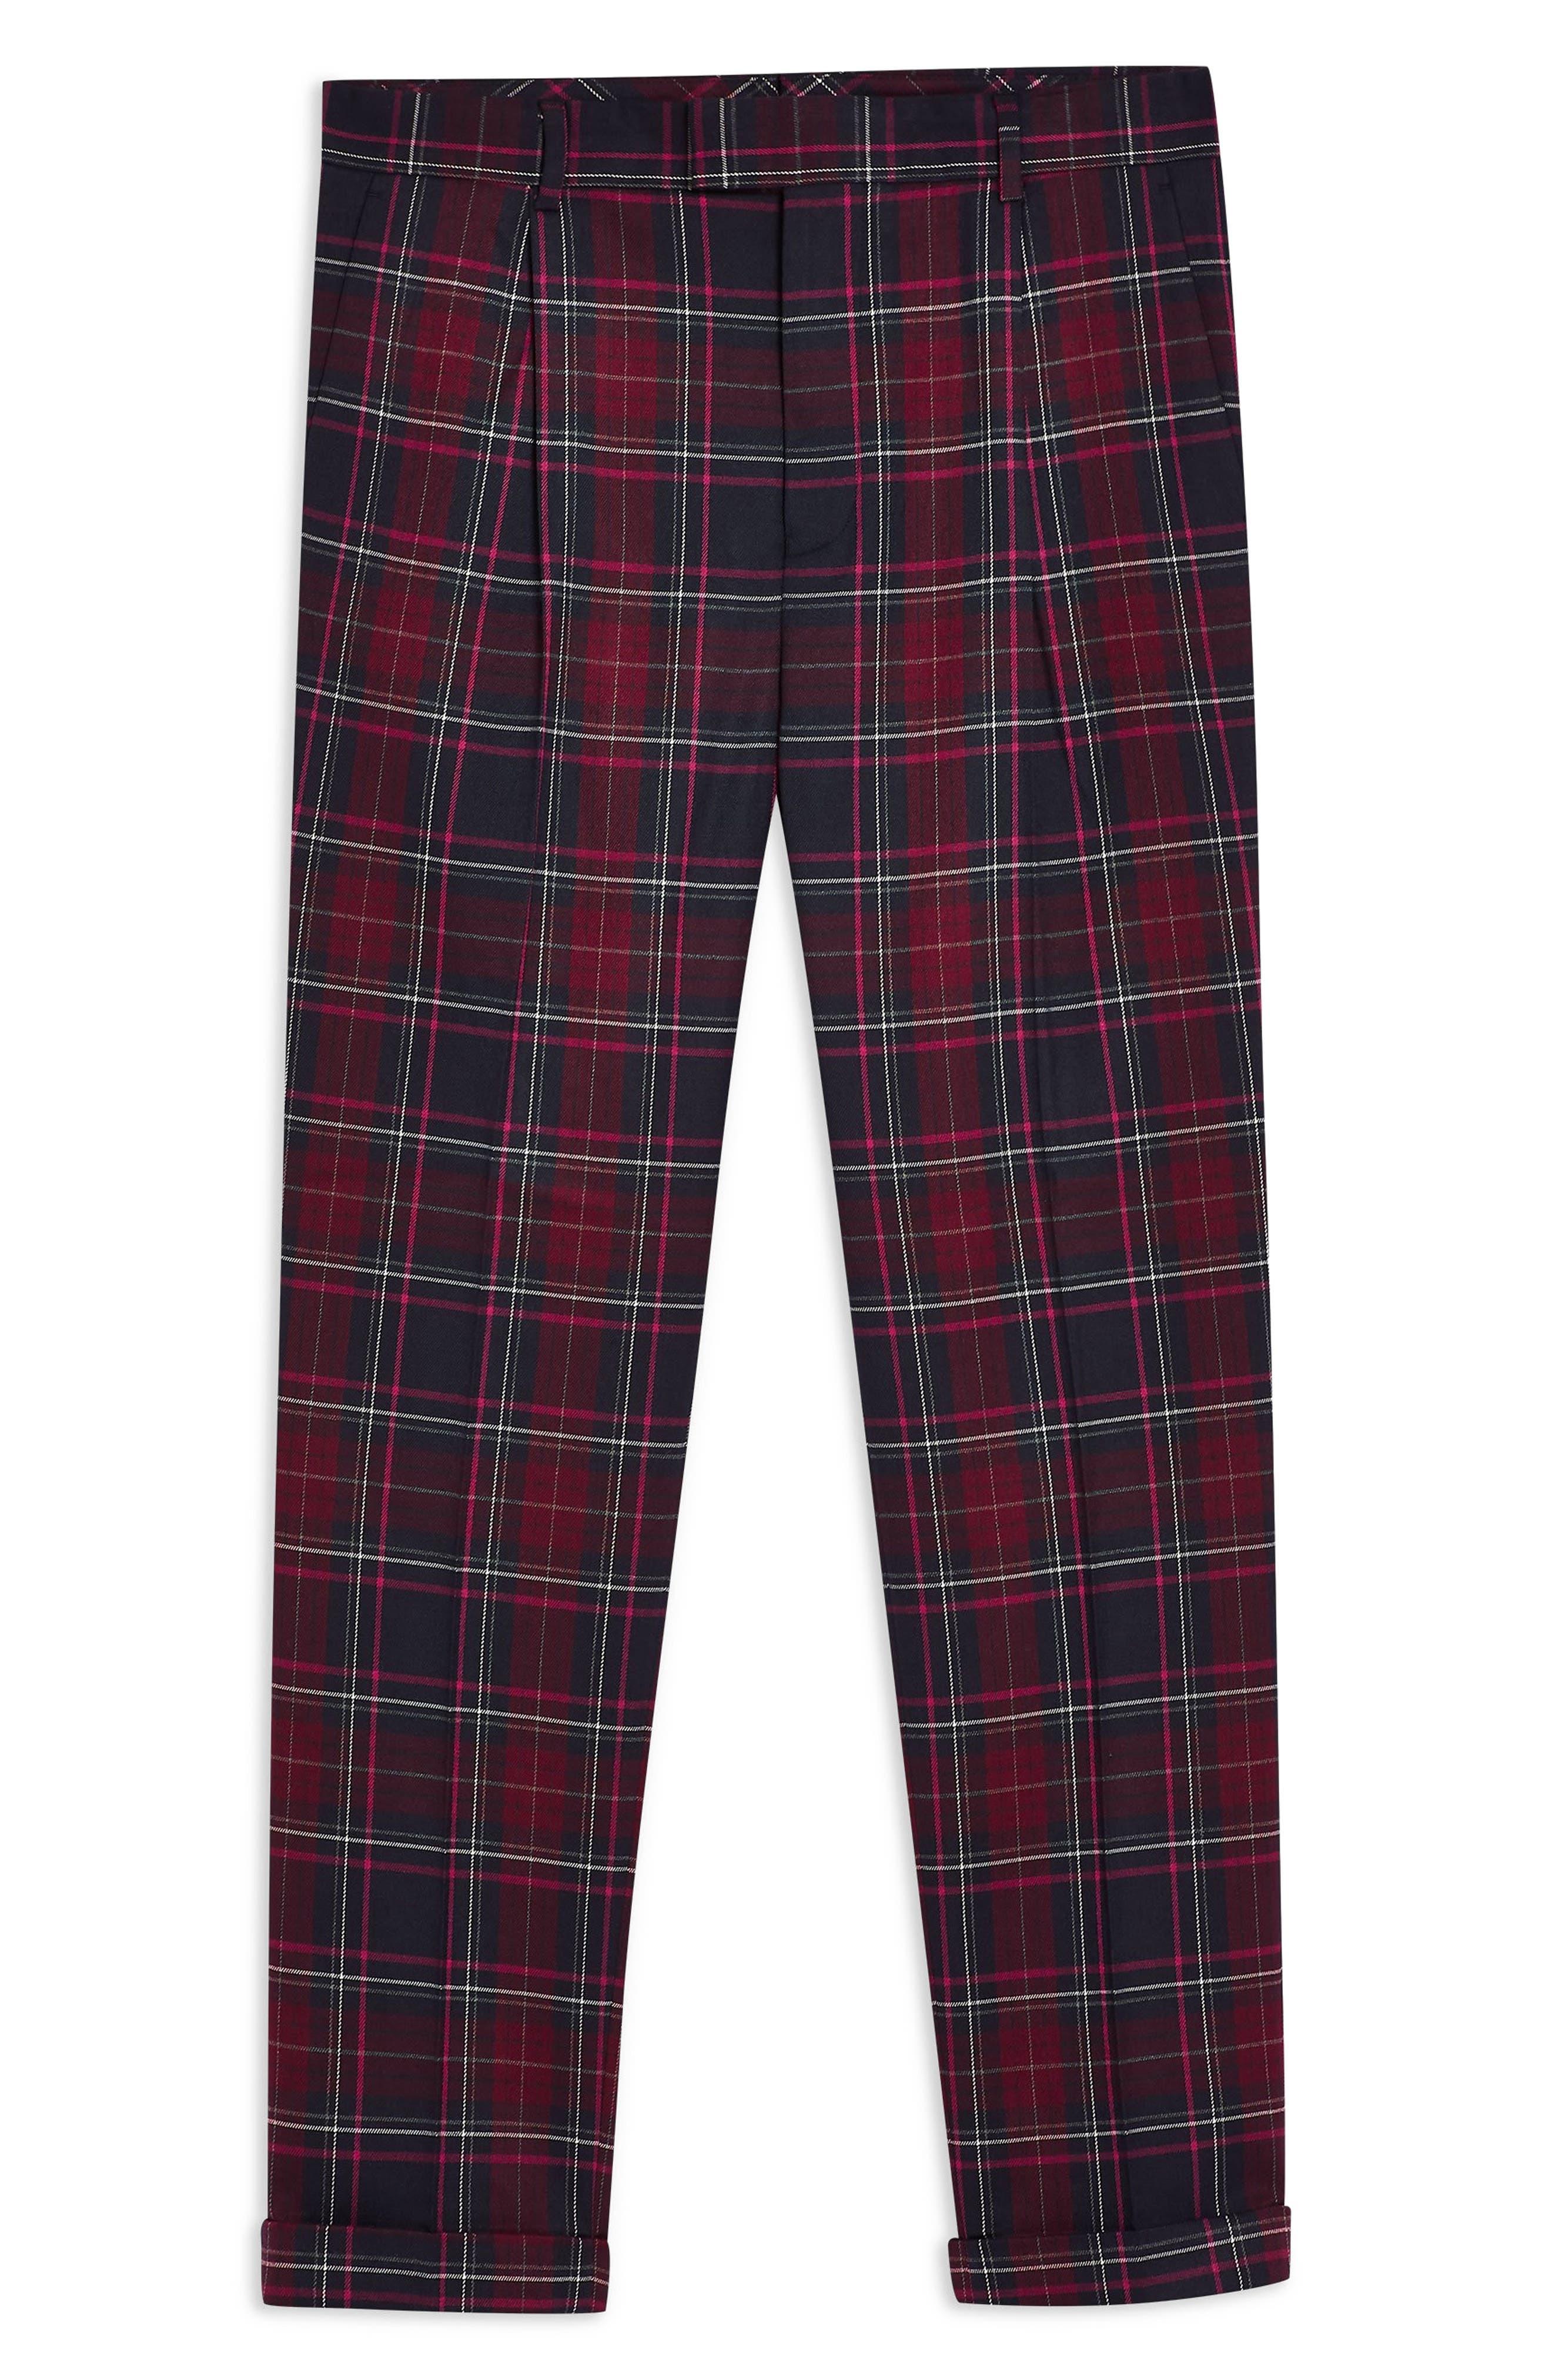 TOPMAN, Skinny Fit Check Trousers, Alternate thumbnail 3, color, BURGUNDY MULTI